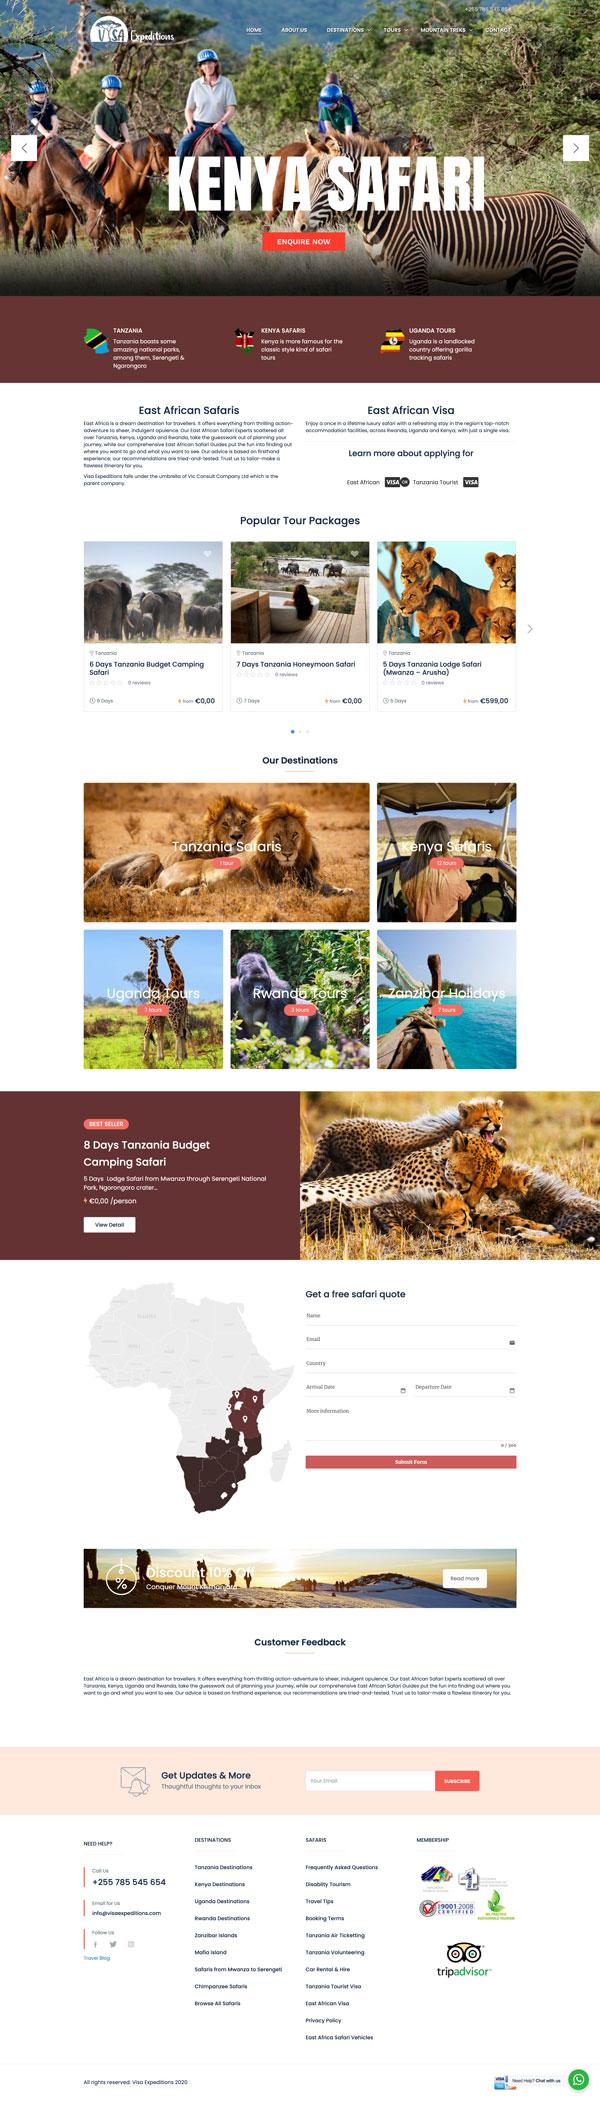 Visa Expeditions Website